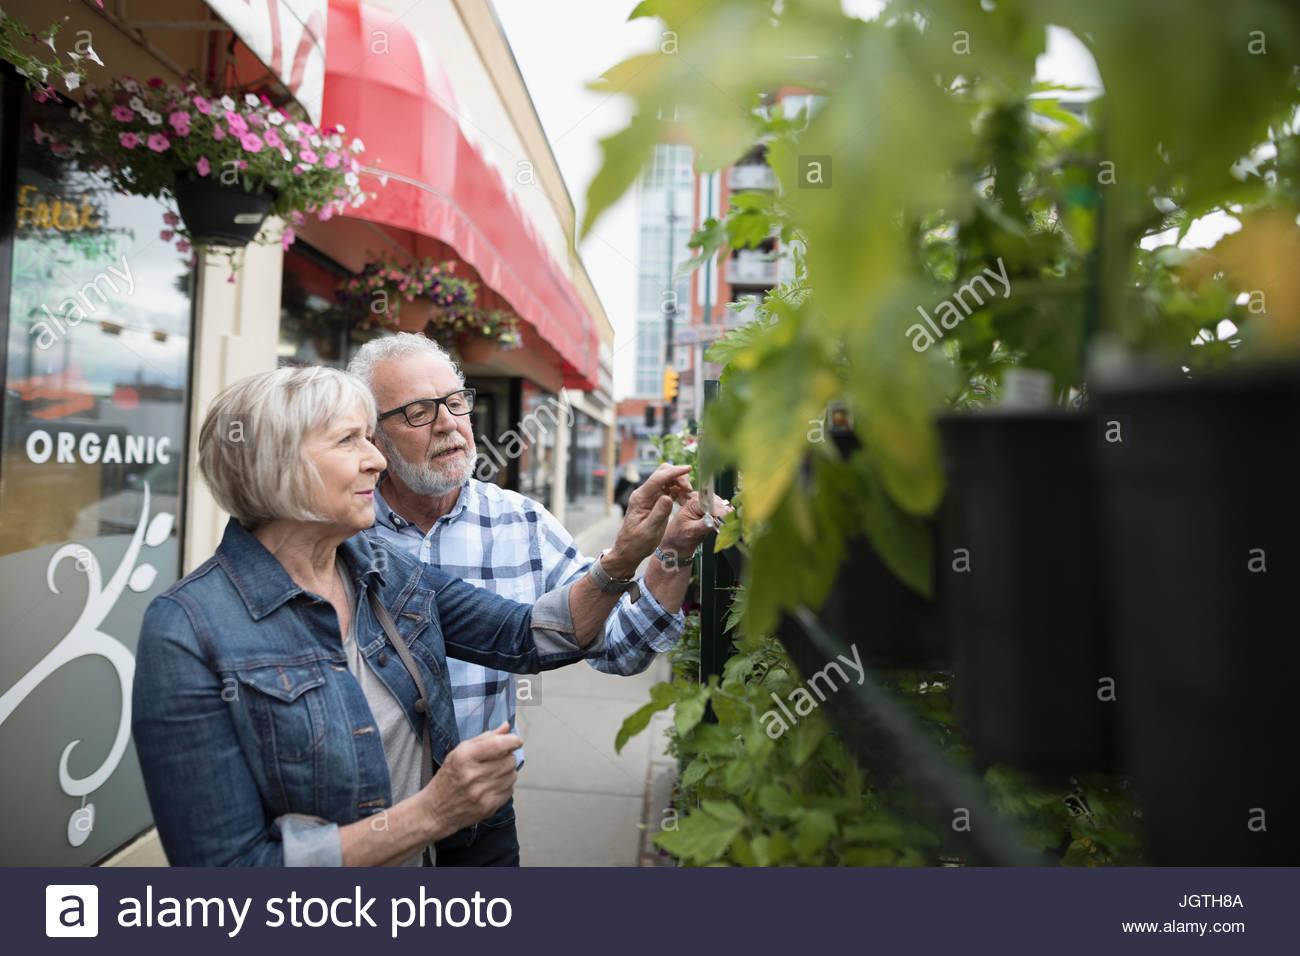 Senior couple shopping for plants at urban storefront sidewalk - Stock Image